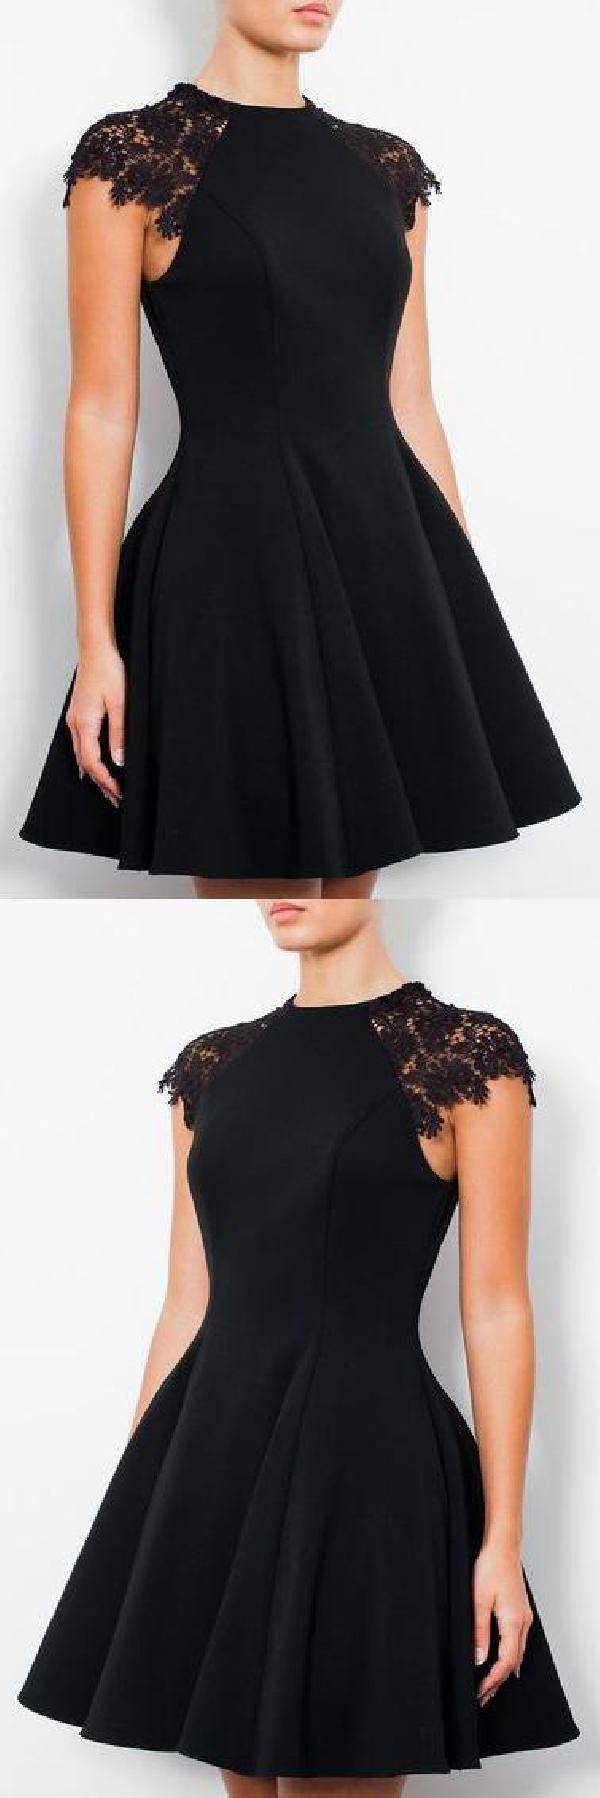 的 hot sale comely lace cute black lace short 主题